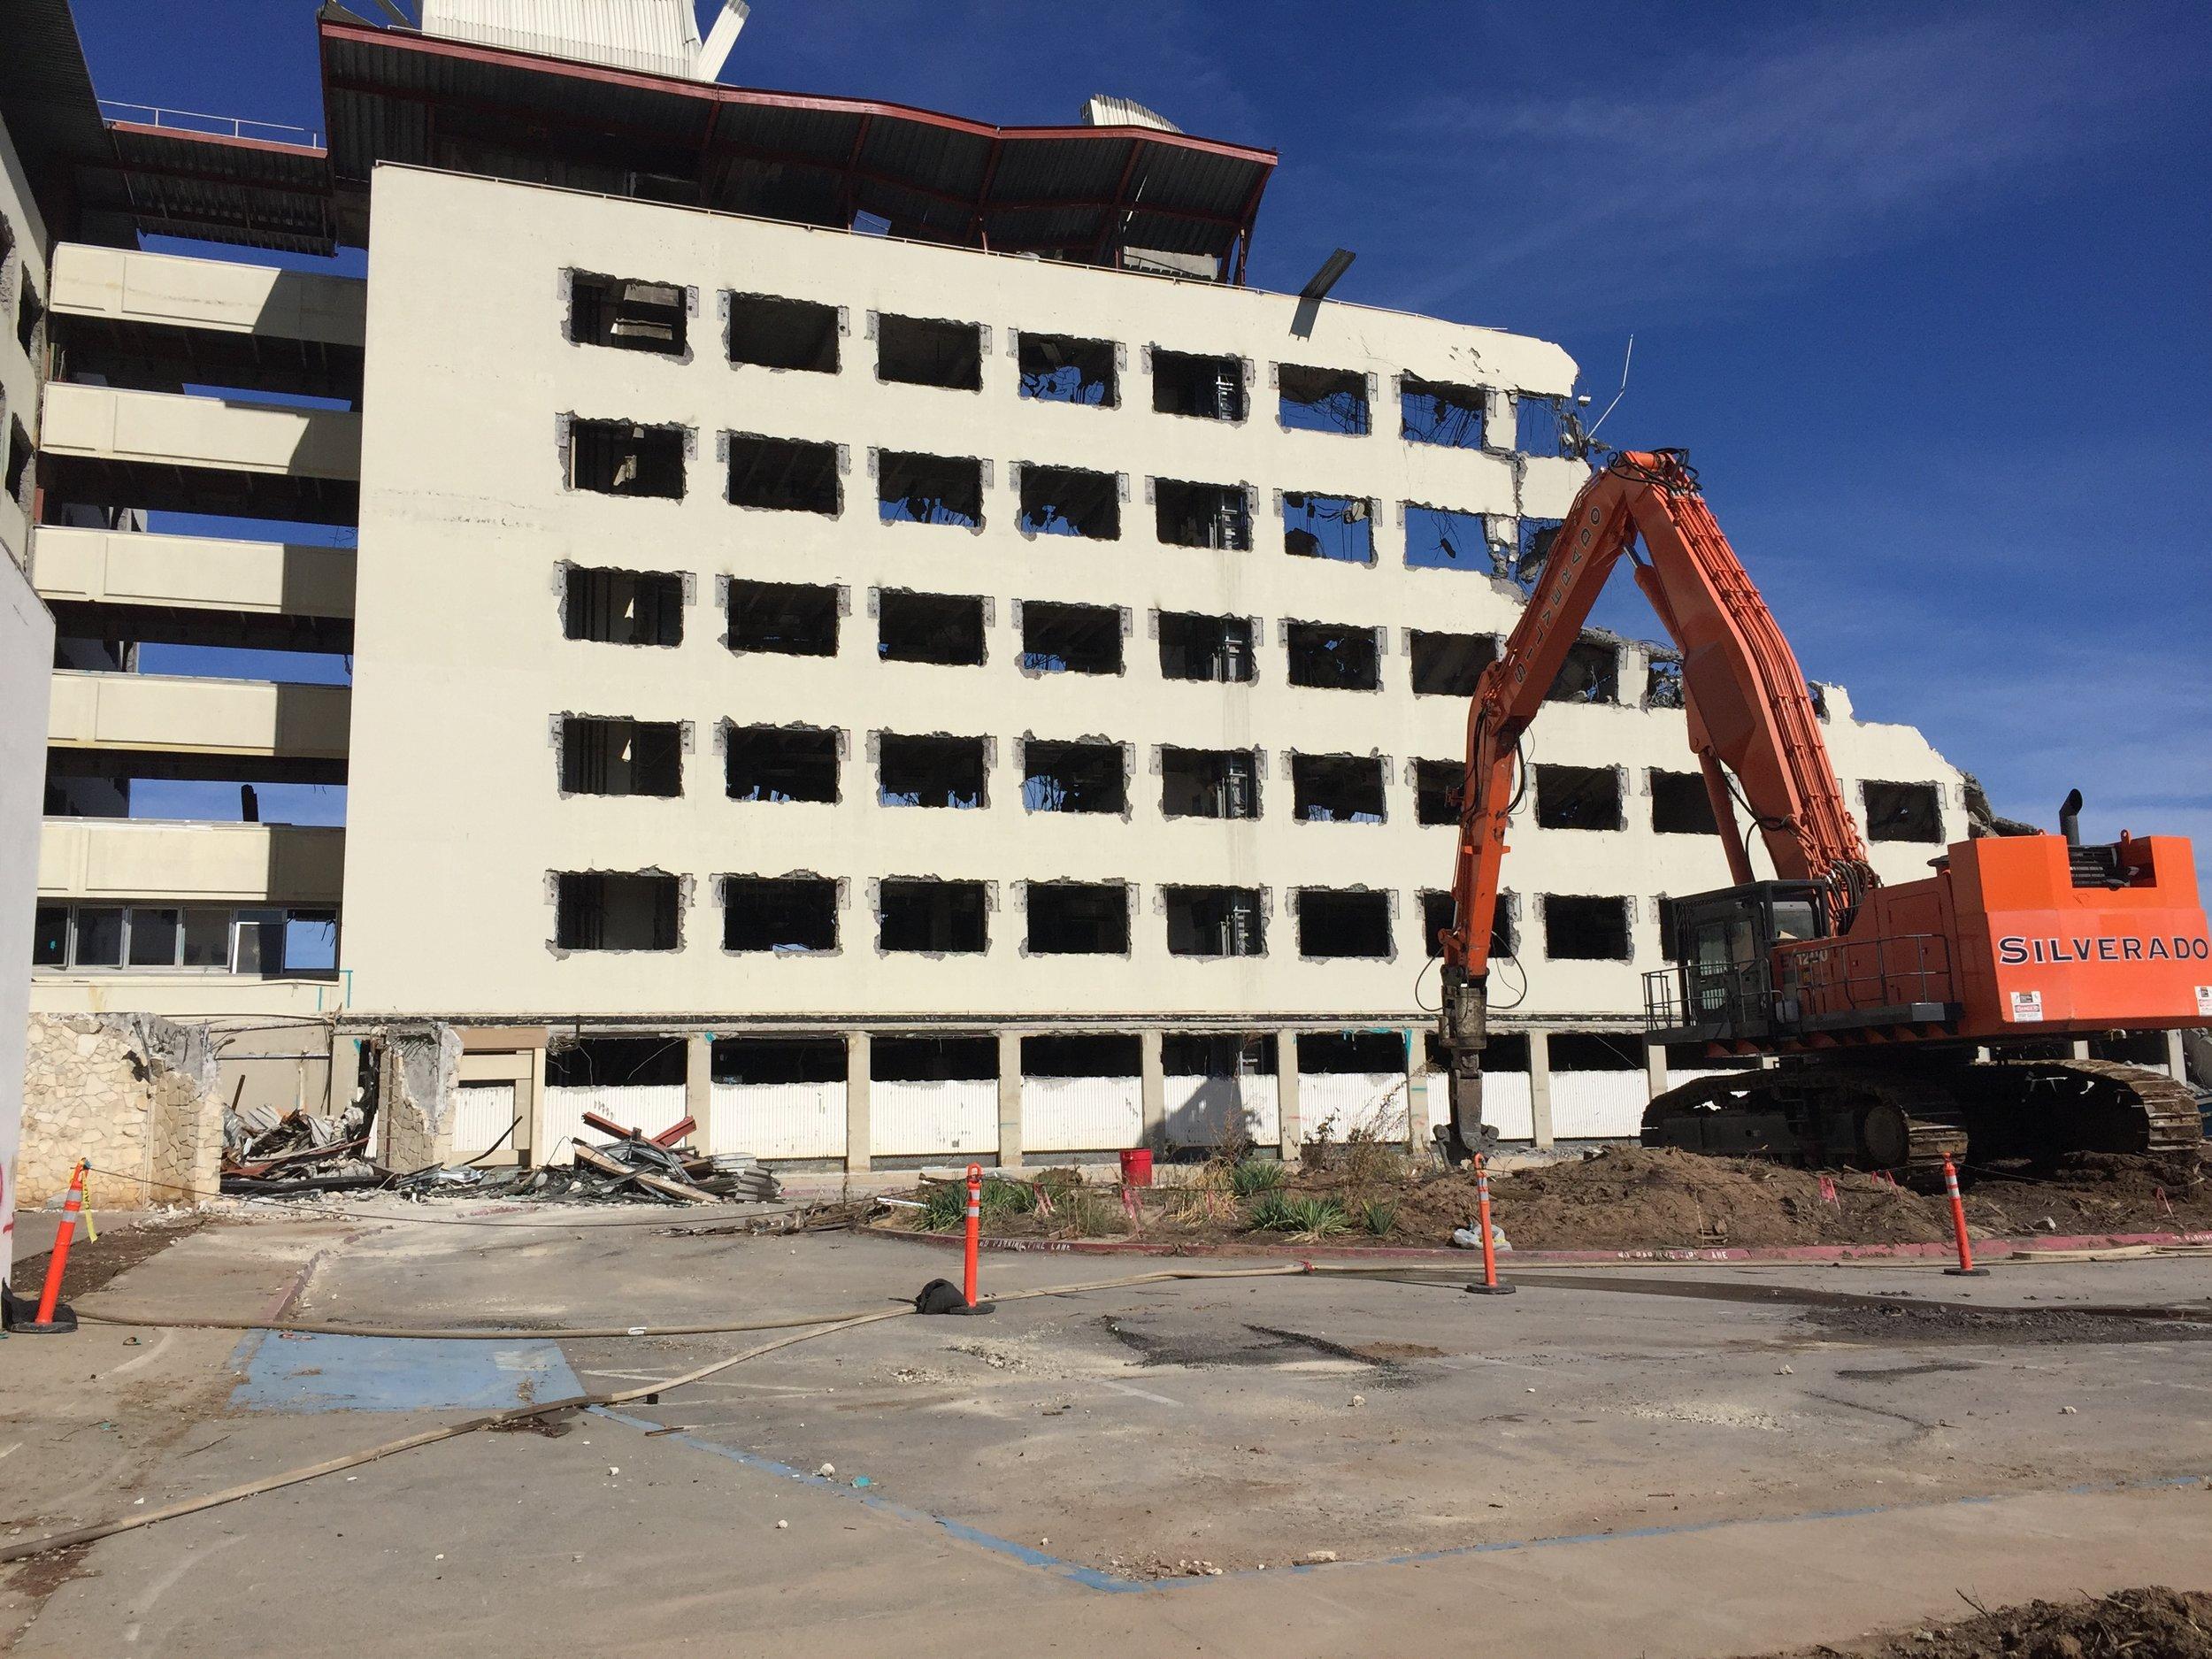 Demolishing the whole building...